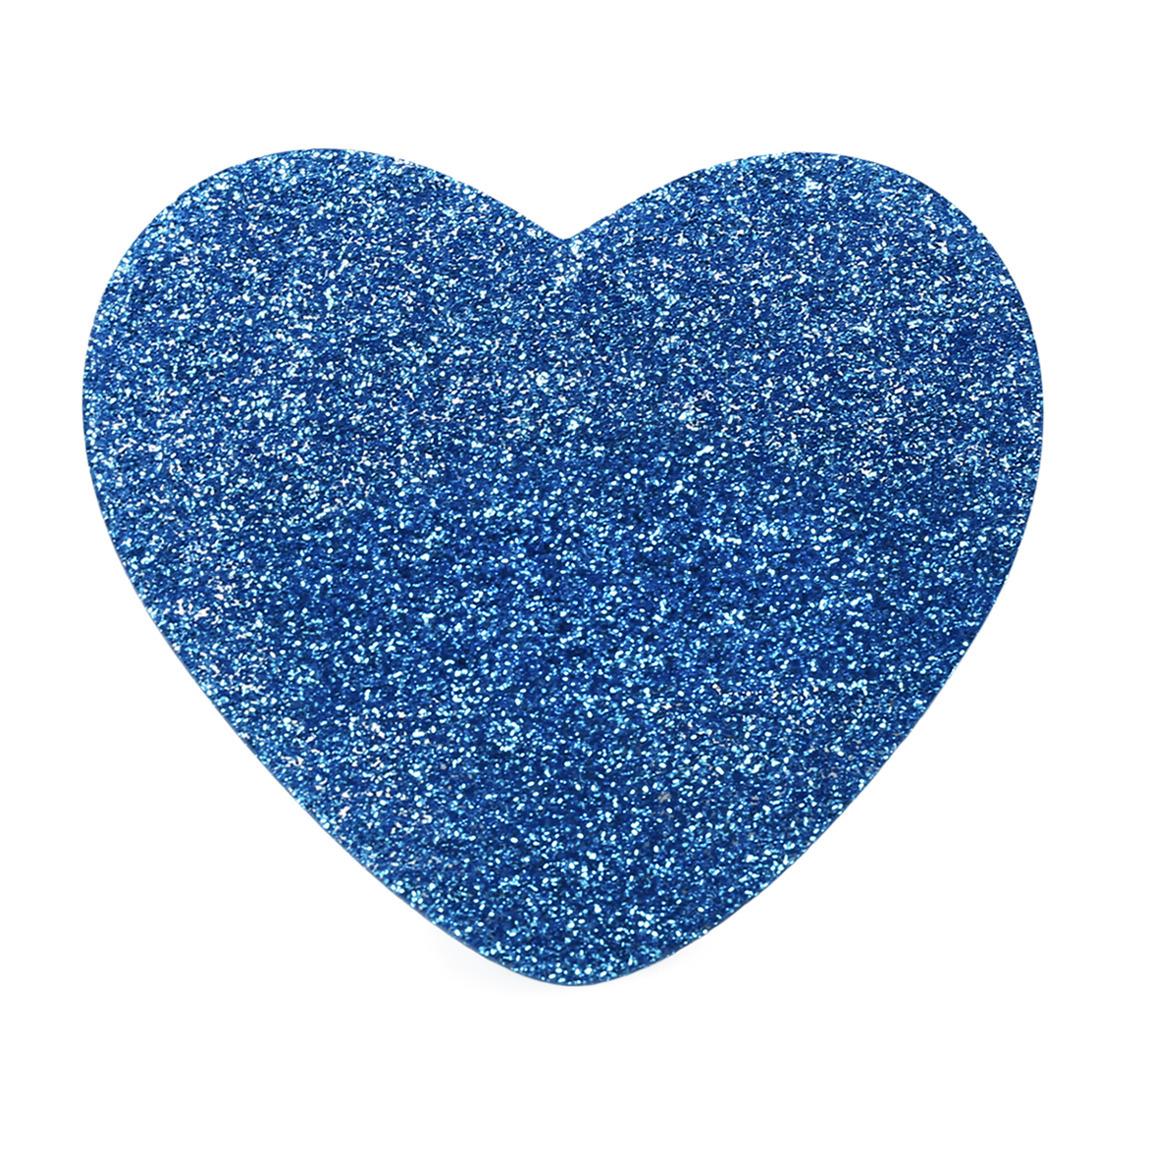 Paw Palette Aquamarine Glitter Mini Luv product swatch.